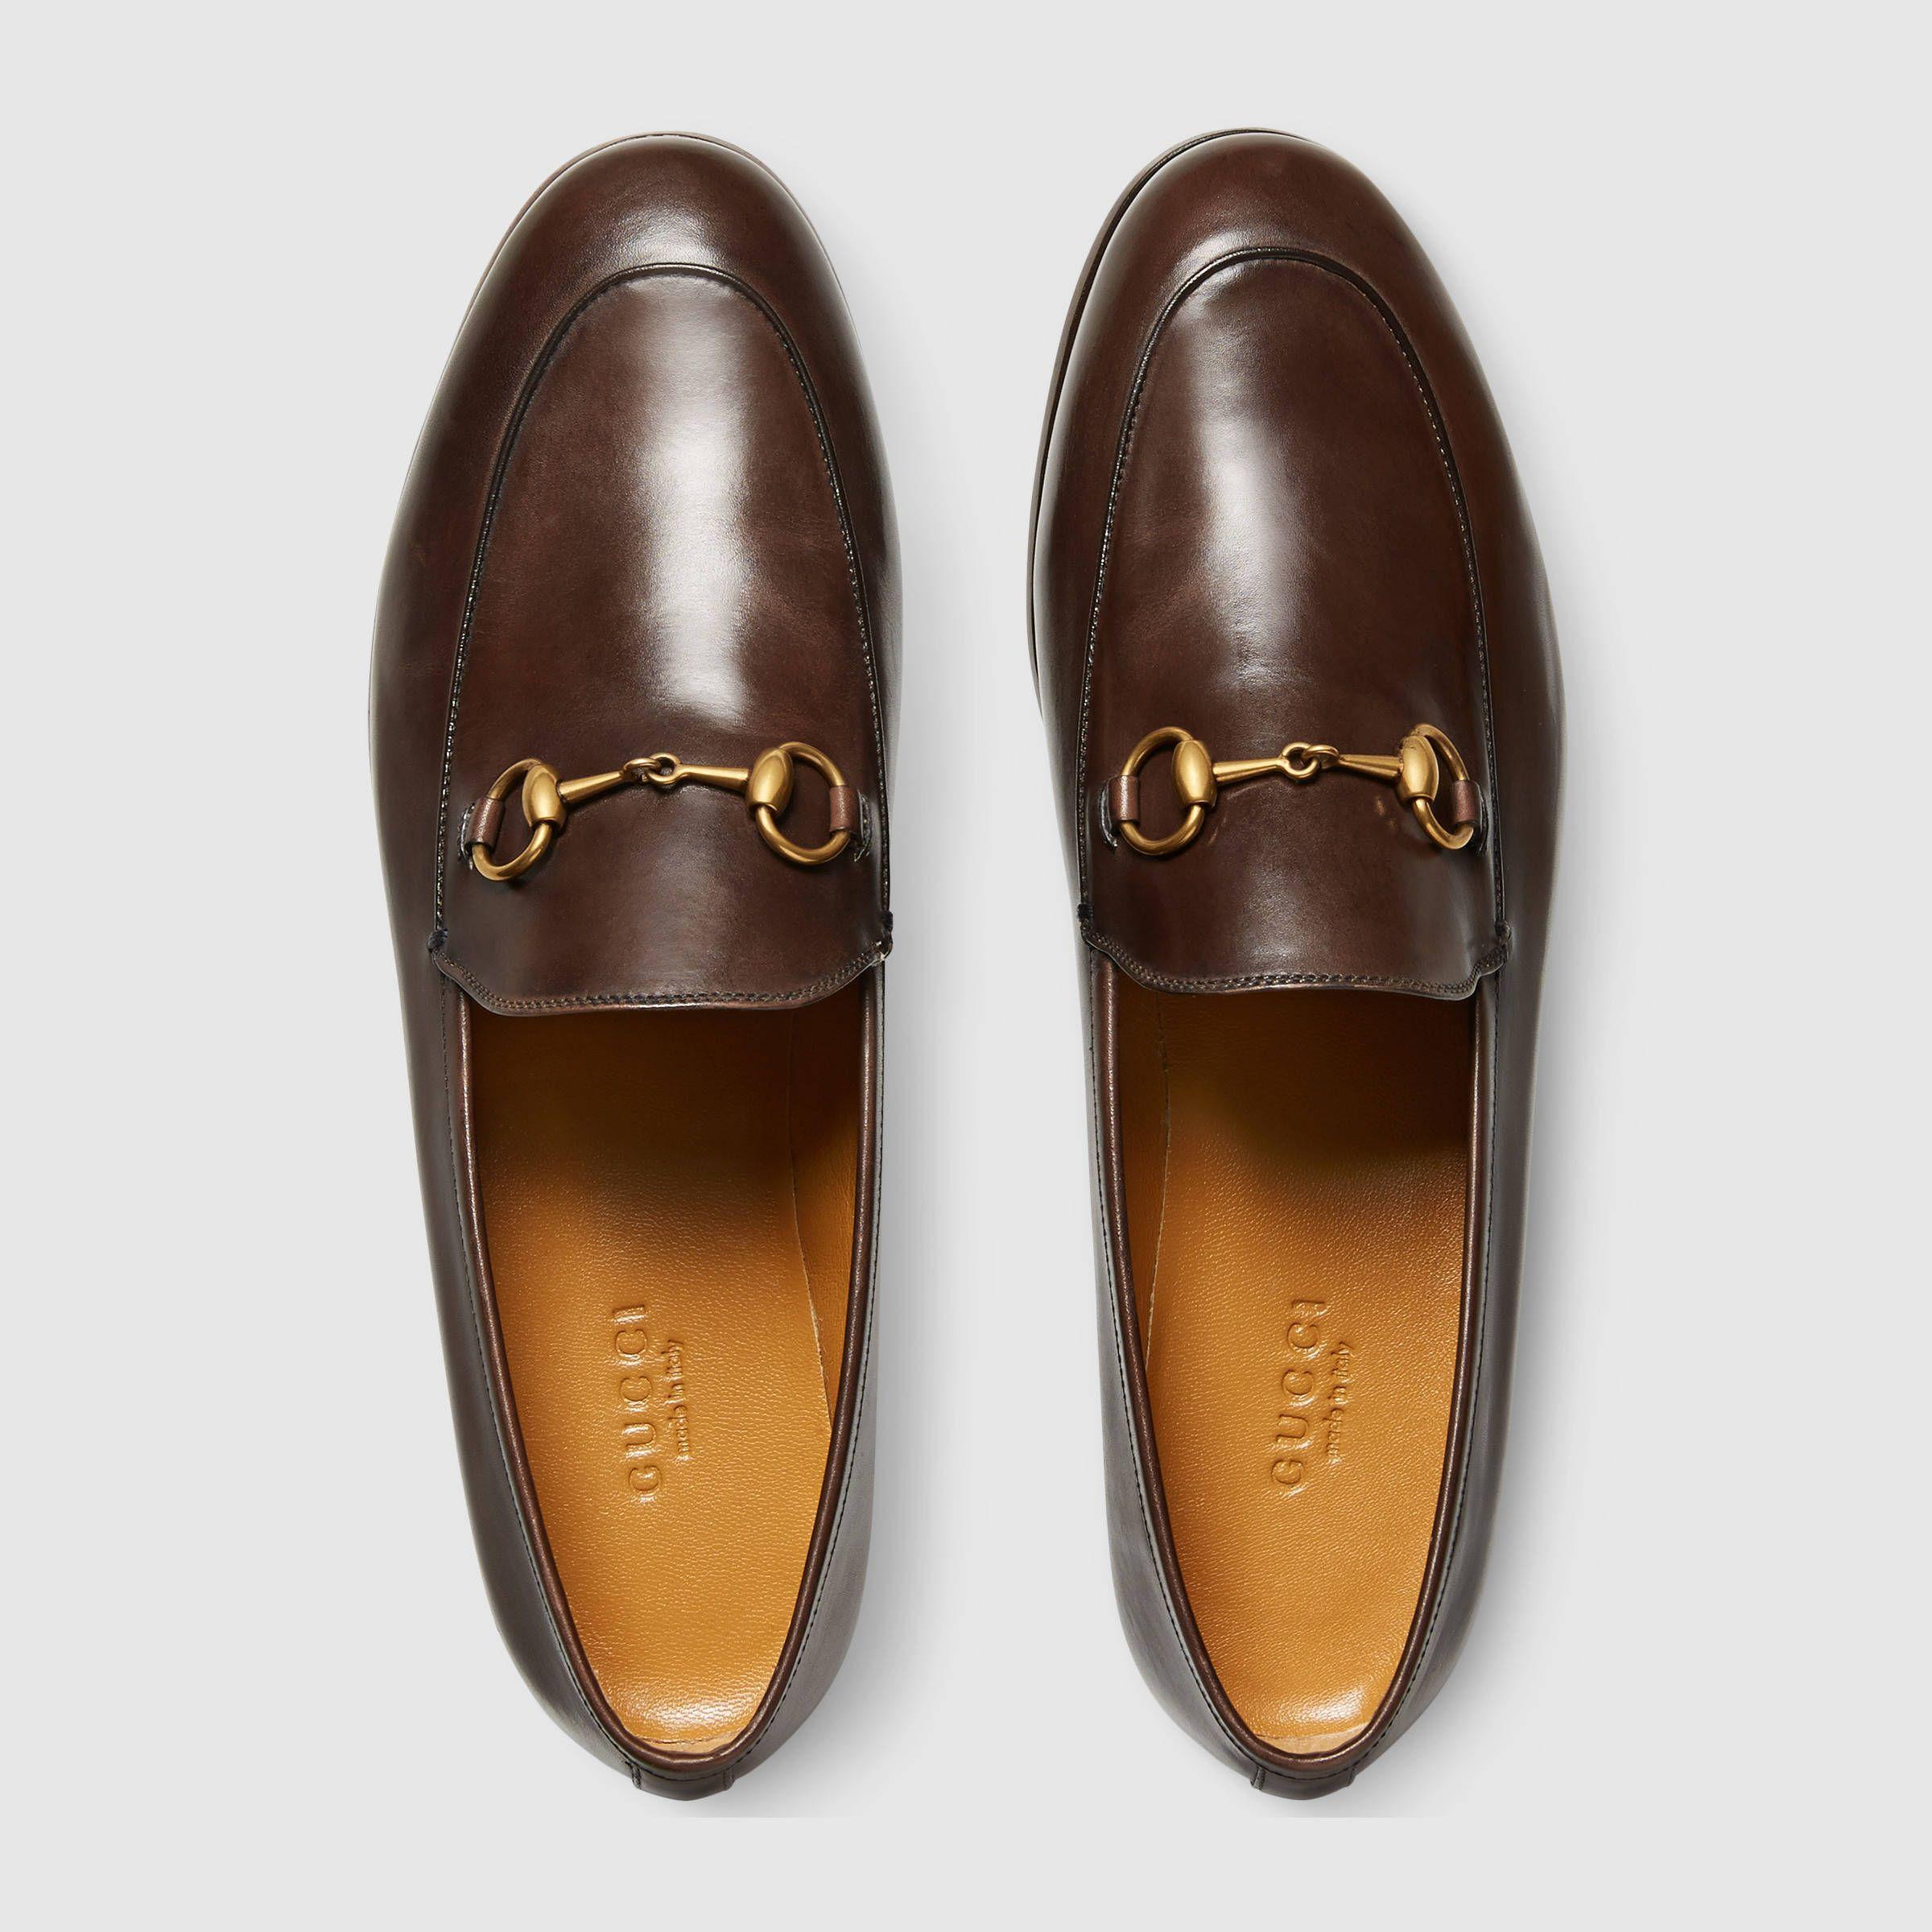 f34c2146cfd Gucci Jordaan Loafer w horsebit detail (Black Leather)